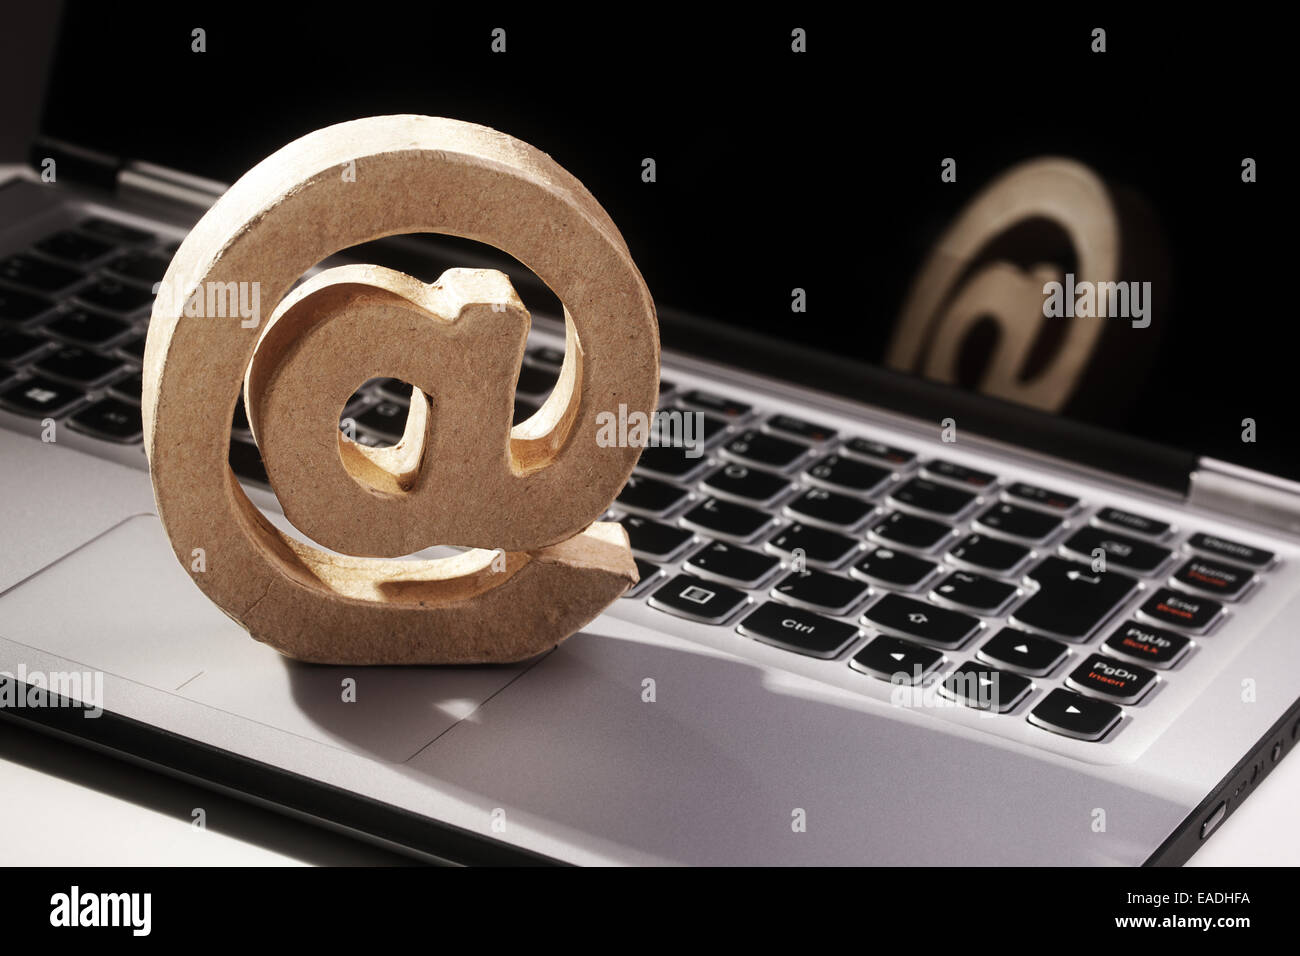 E-mail @ symbol - Stock Image